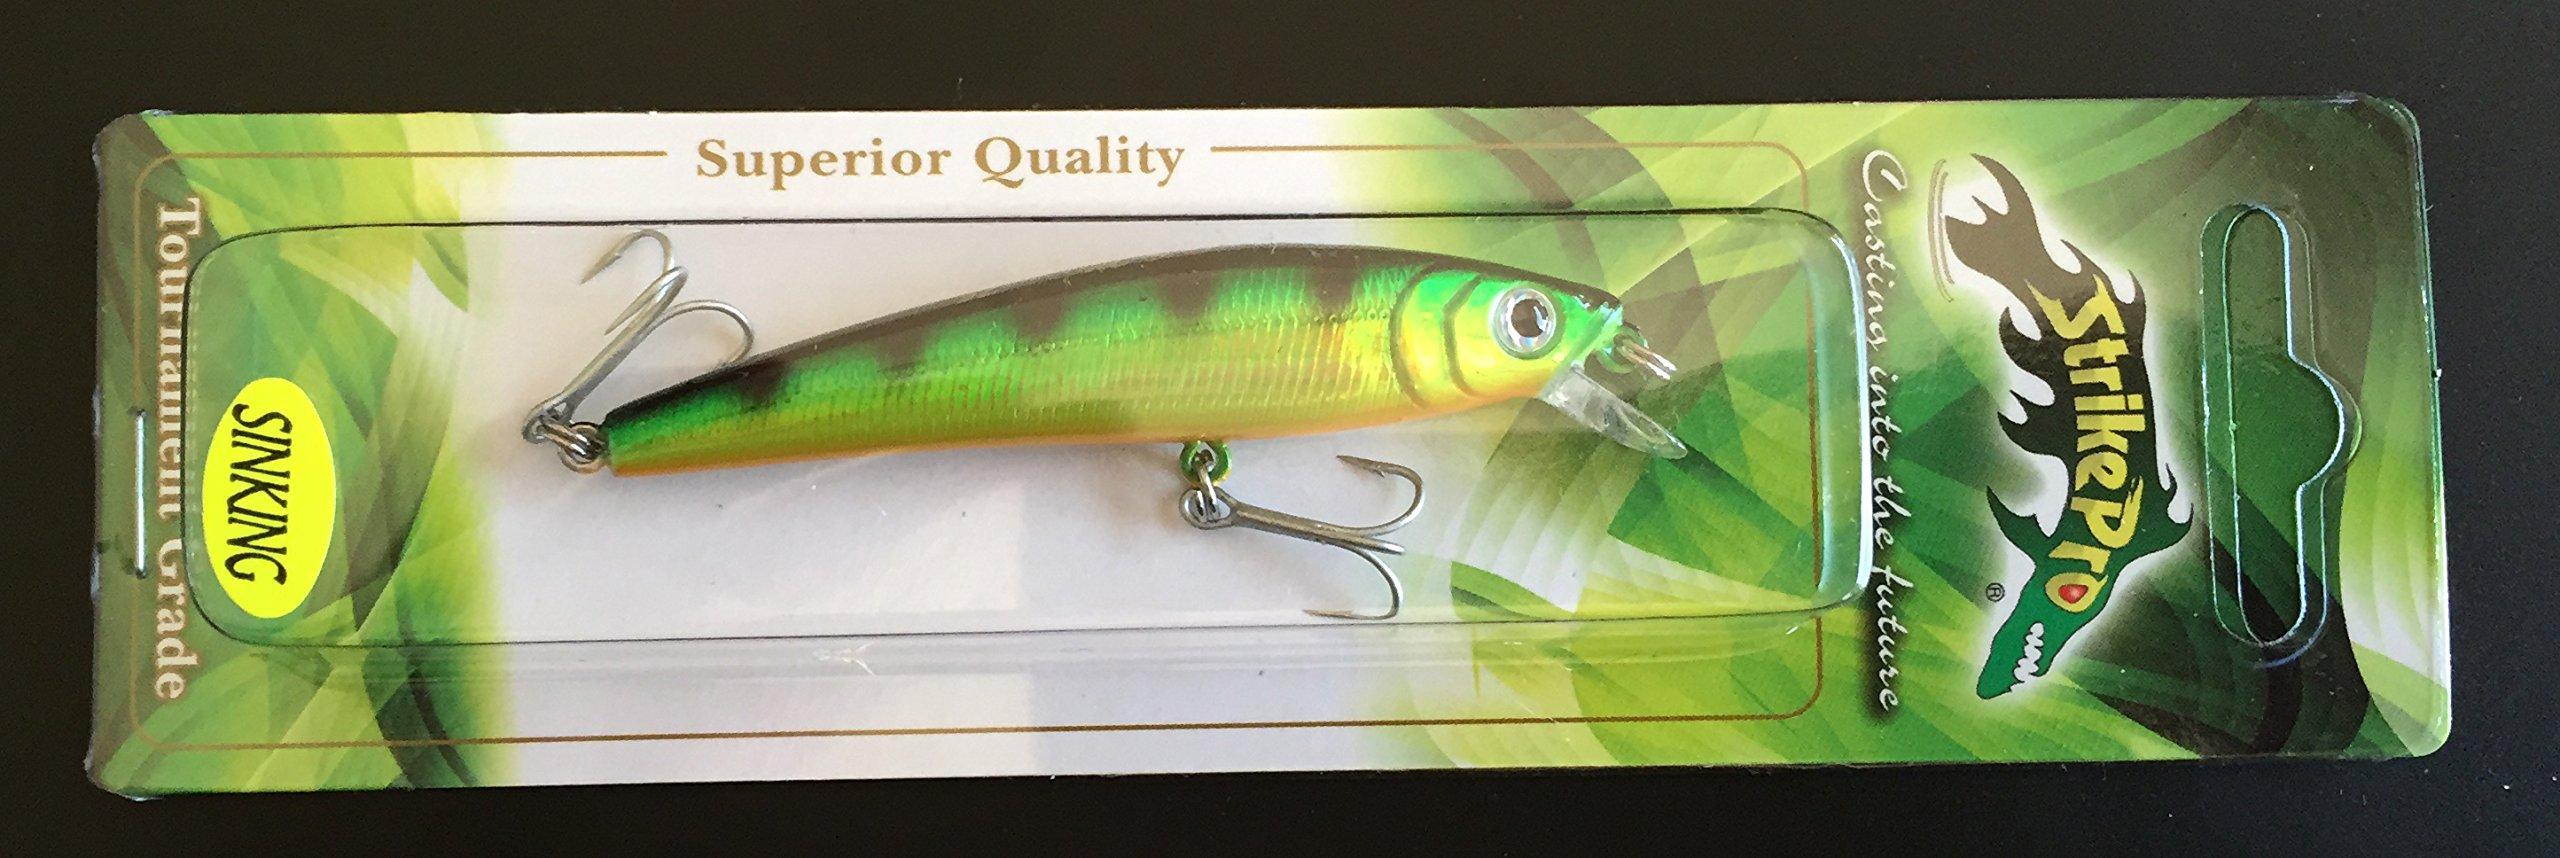 StrikePro - ARC Minnow 75, Color 75 mm (6 gr), Talla 6 gr: Amazon ...